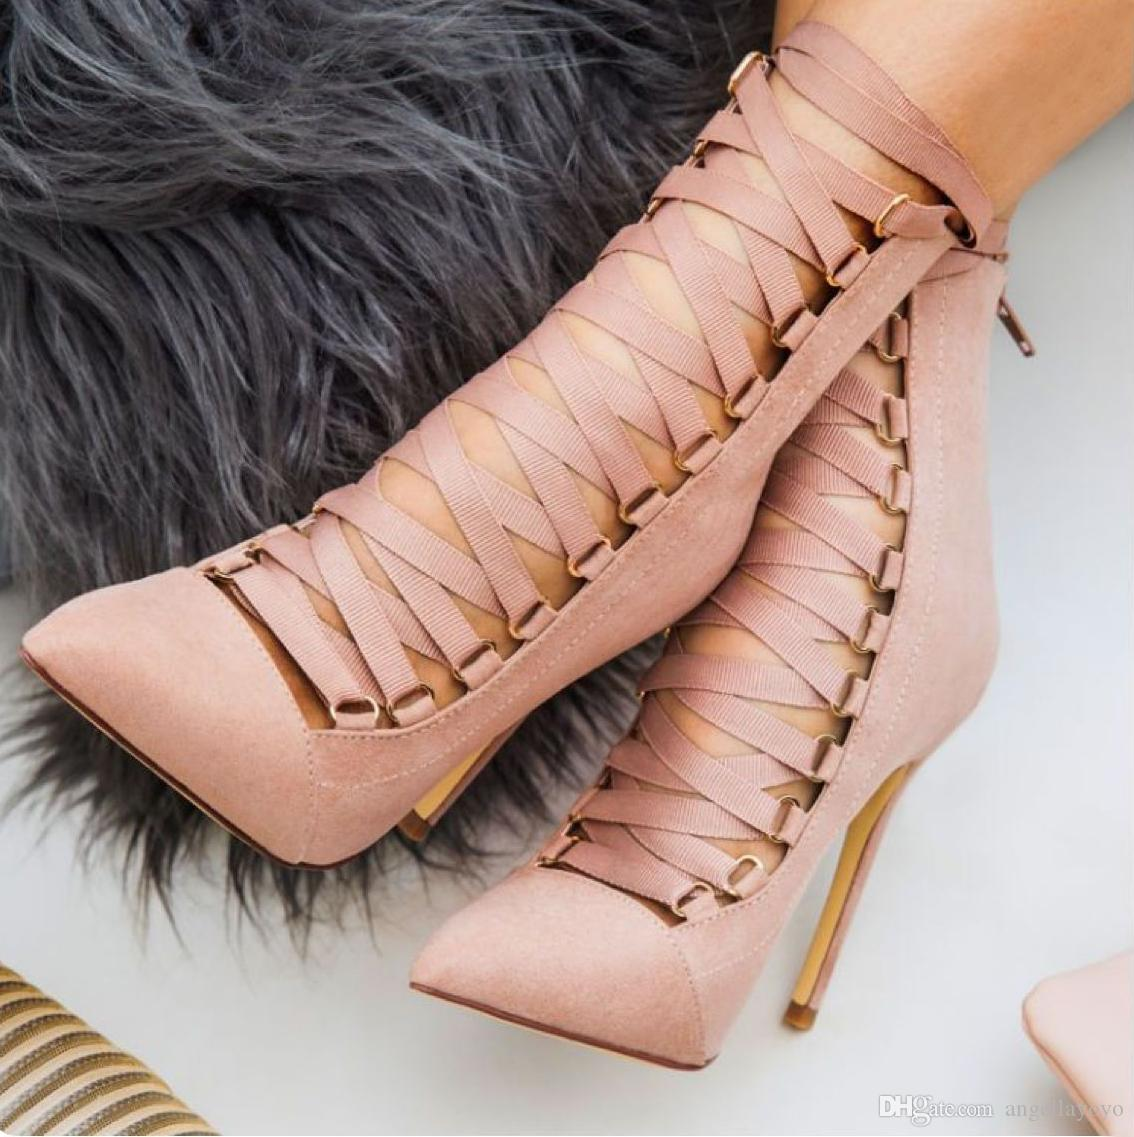 Leopard Block Heels Bottines Loisirs Chaud Dos Fermeture Éclair Chaussures Taille Plus